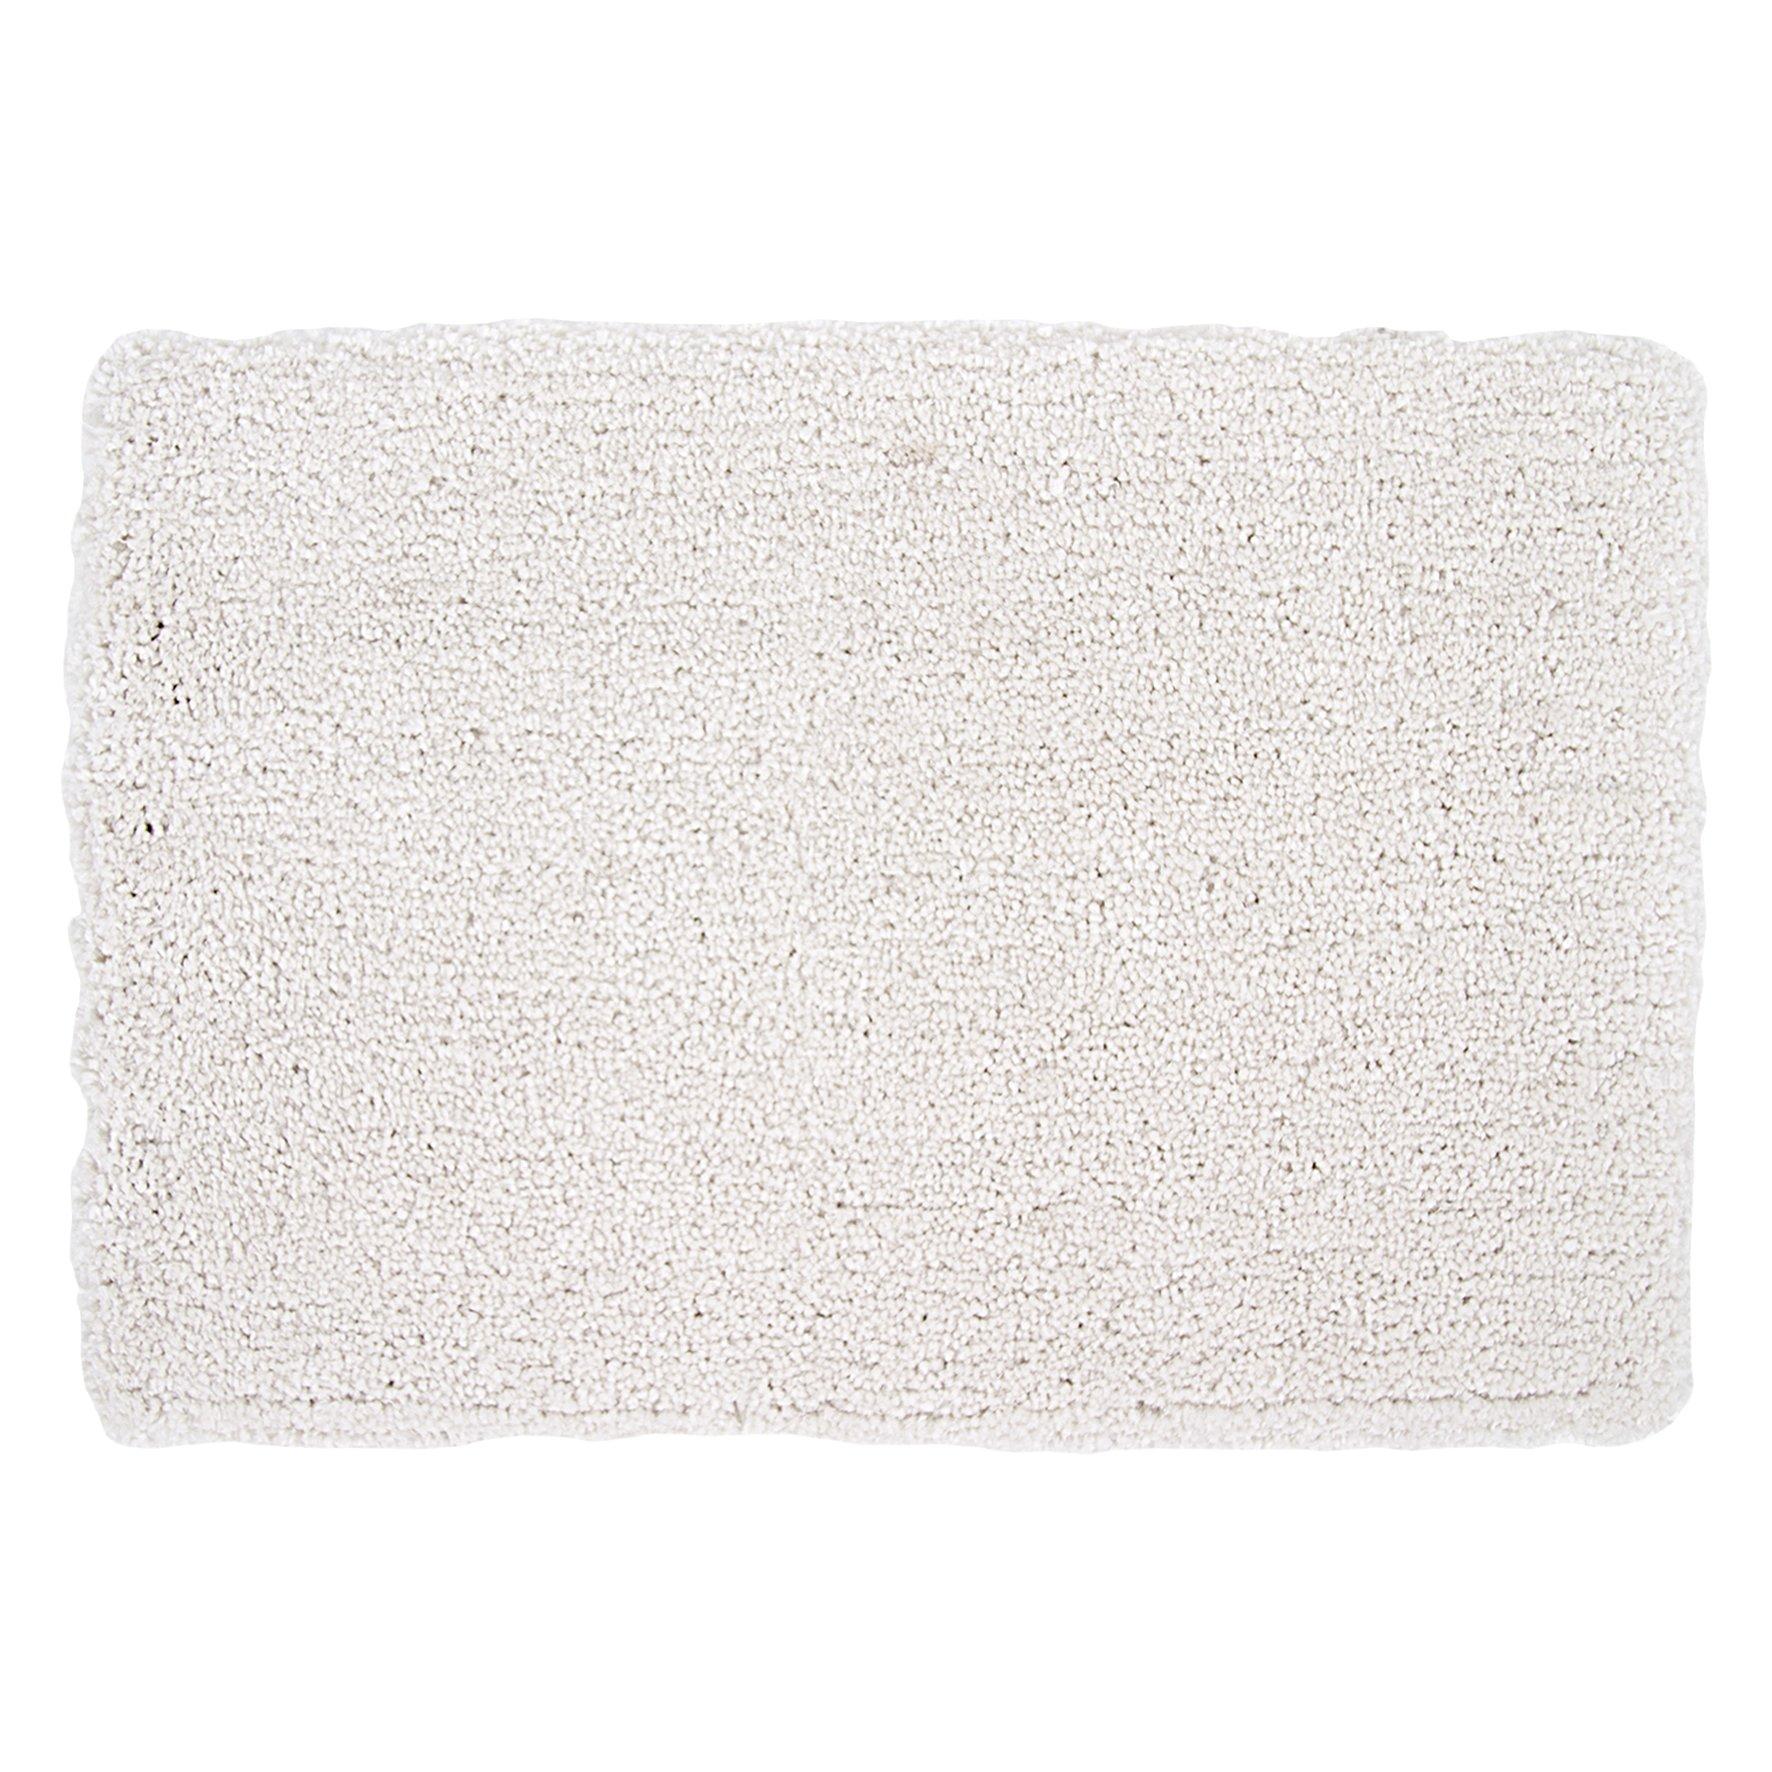 DIFFERNZ 31.102.62Zara Bath Mat, White by Differnz